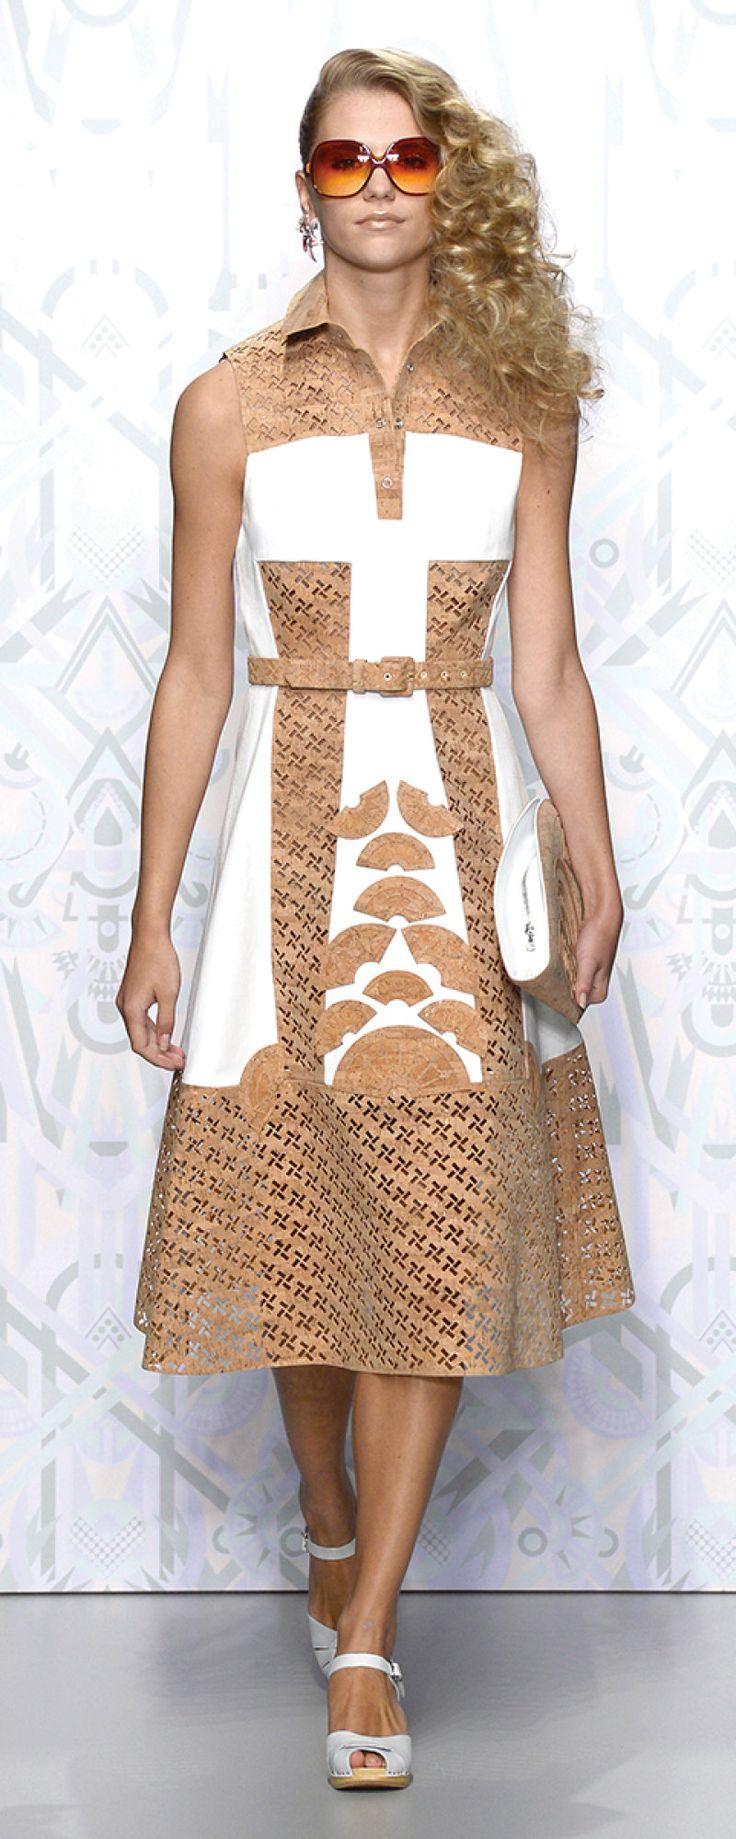 Holly Fulton leva a cortiça à semana da moda de Londres